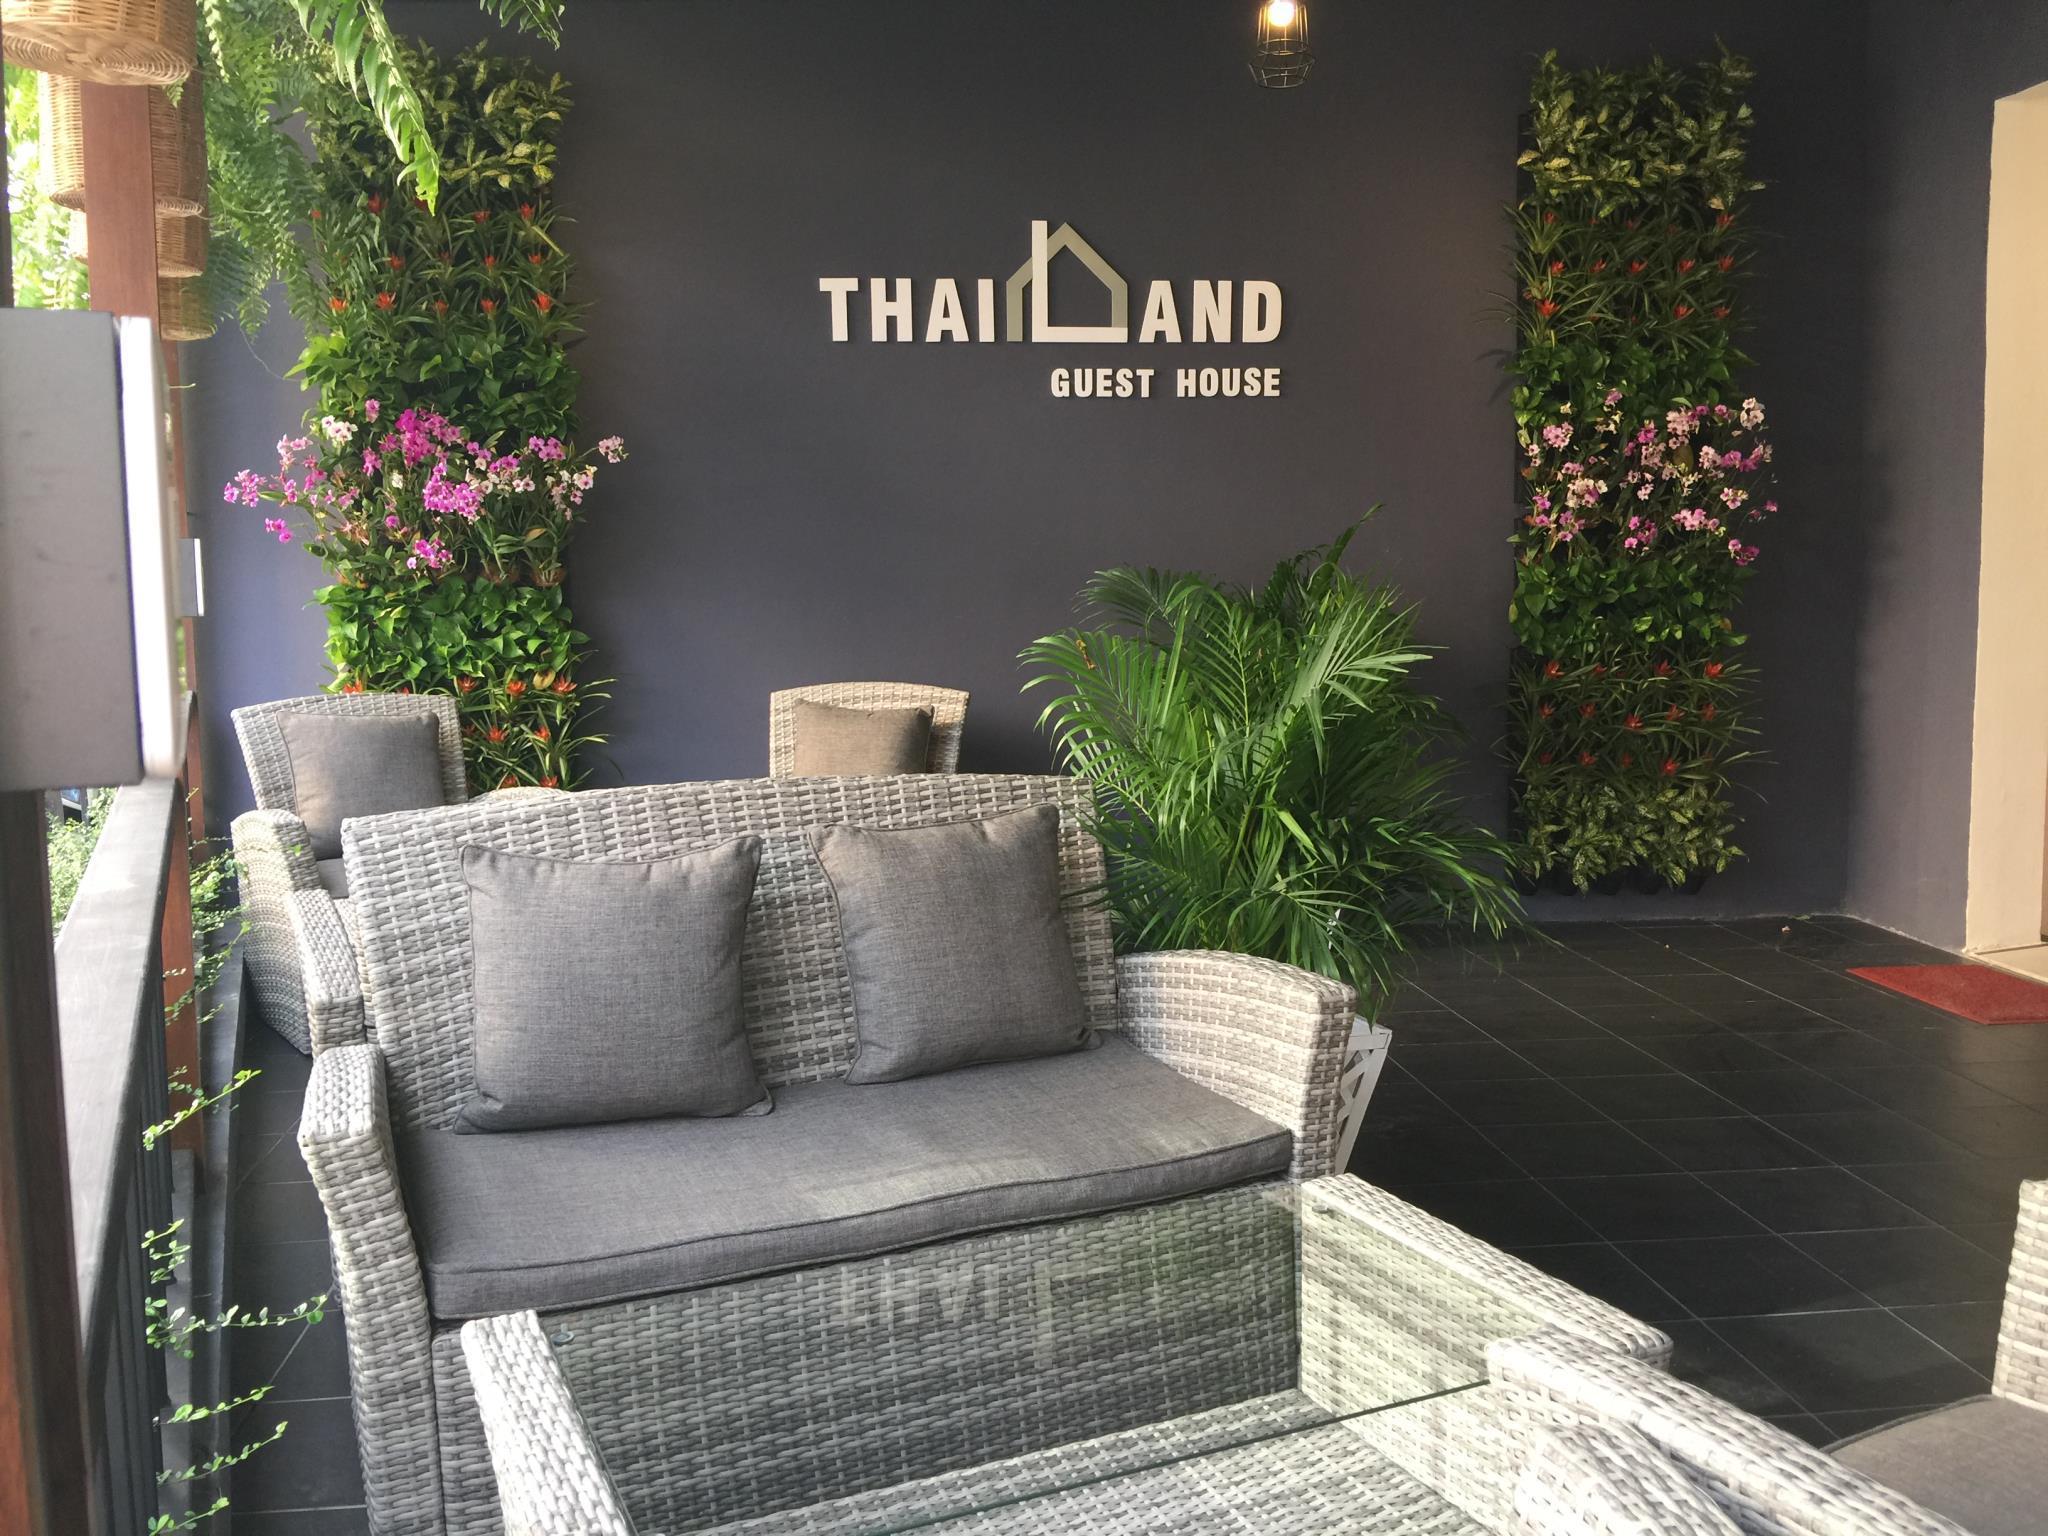 Thailand Guesthouse, Muang Chiang Mai